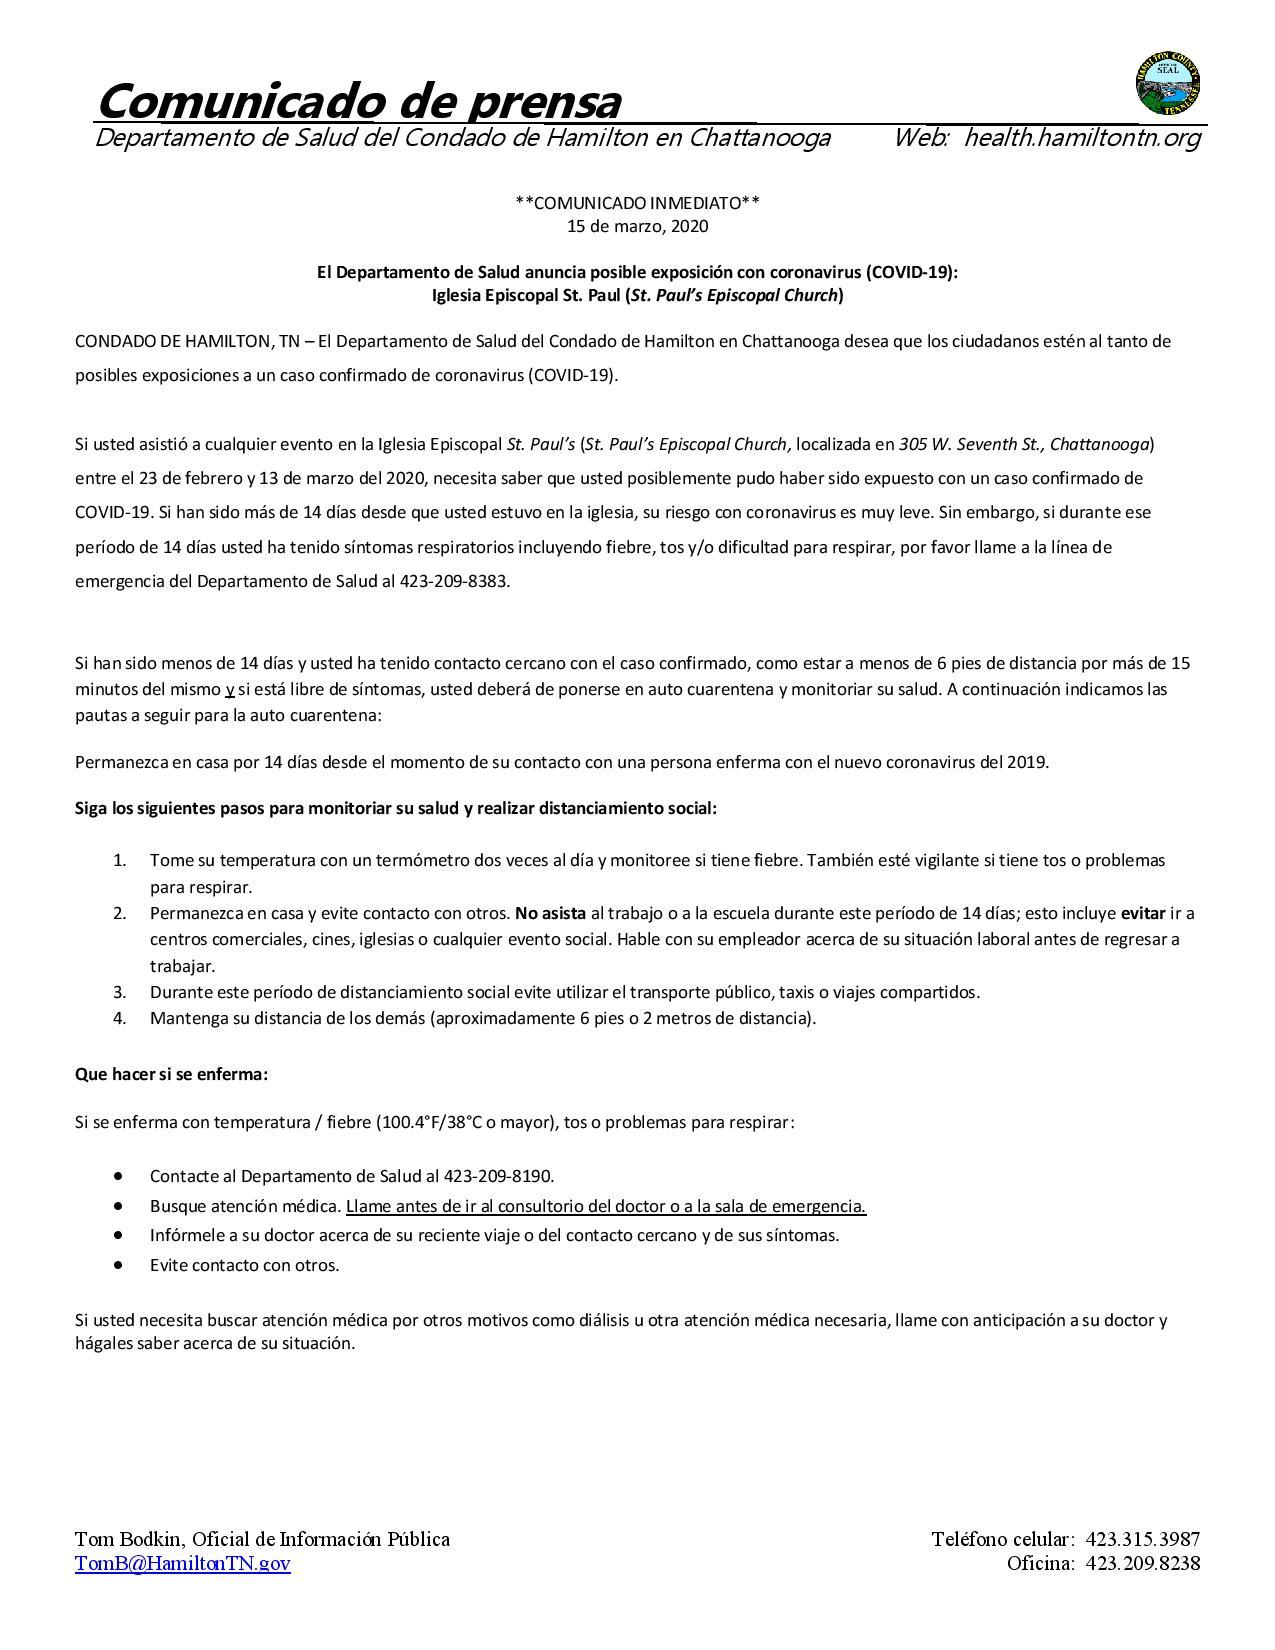 Achatta3-15-20 (Spanish)-page-001